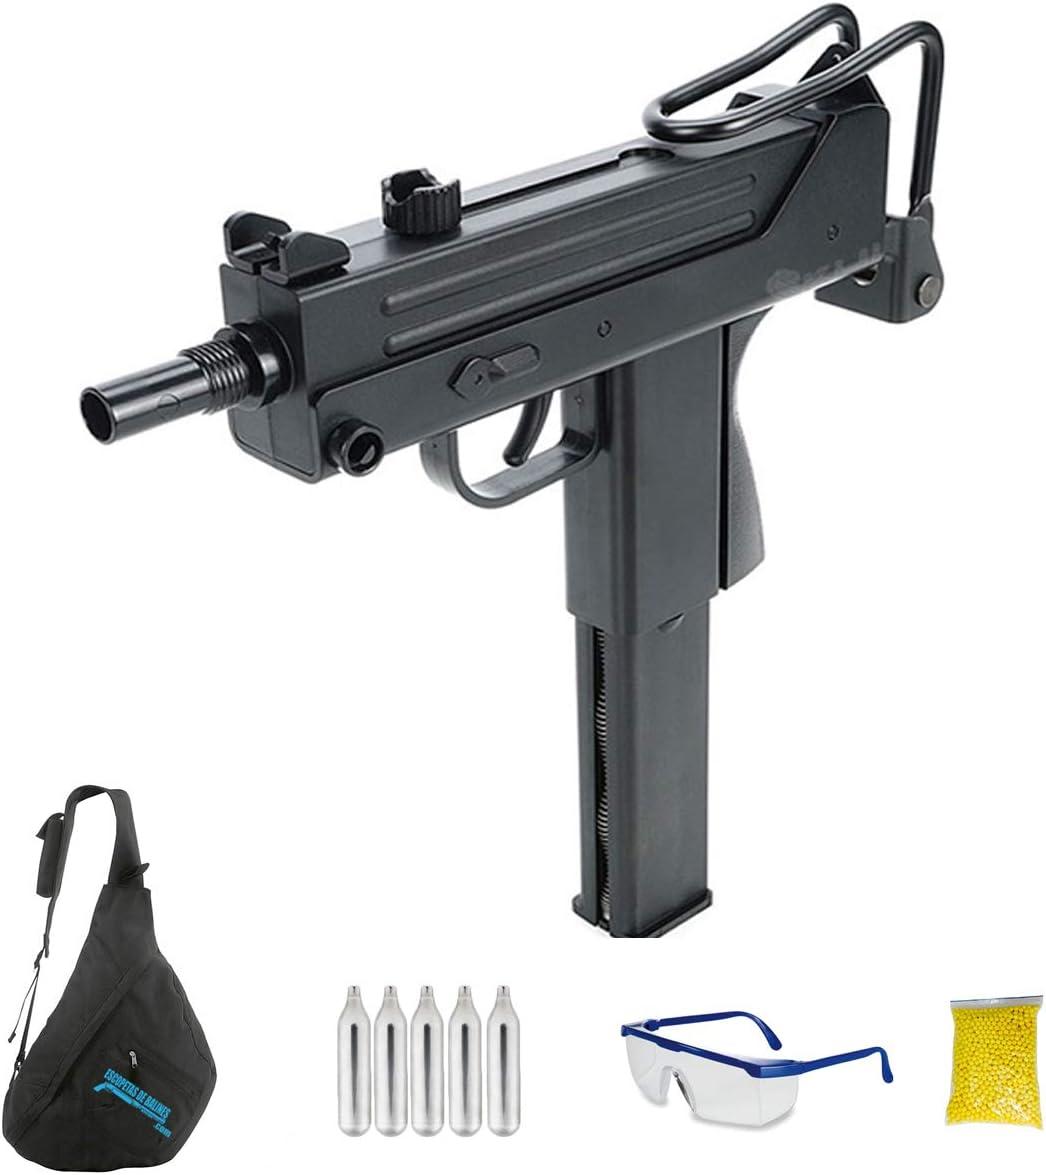 KWC M11 (6MM - Pistola de Airsoft Calibre 6mm (Arma Aire Suave de Bolas de plástico o PVC). Sistema: CO2. <3,5J